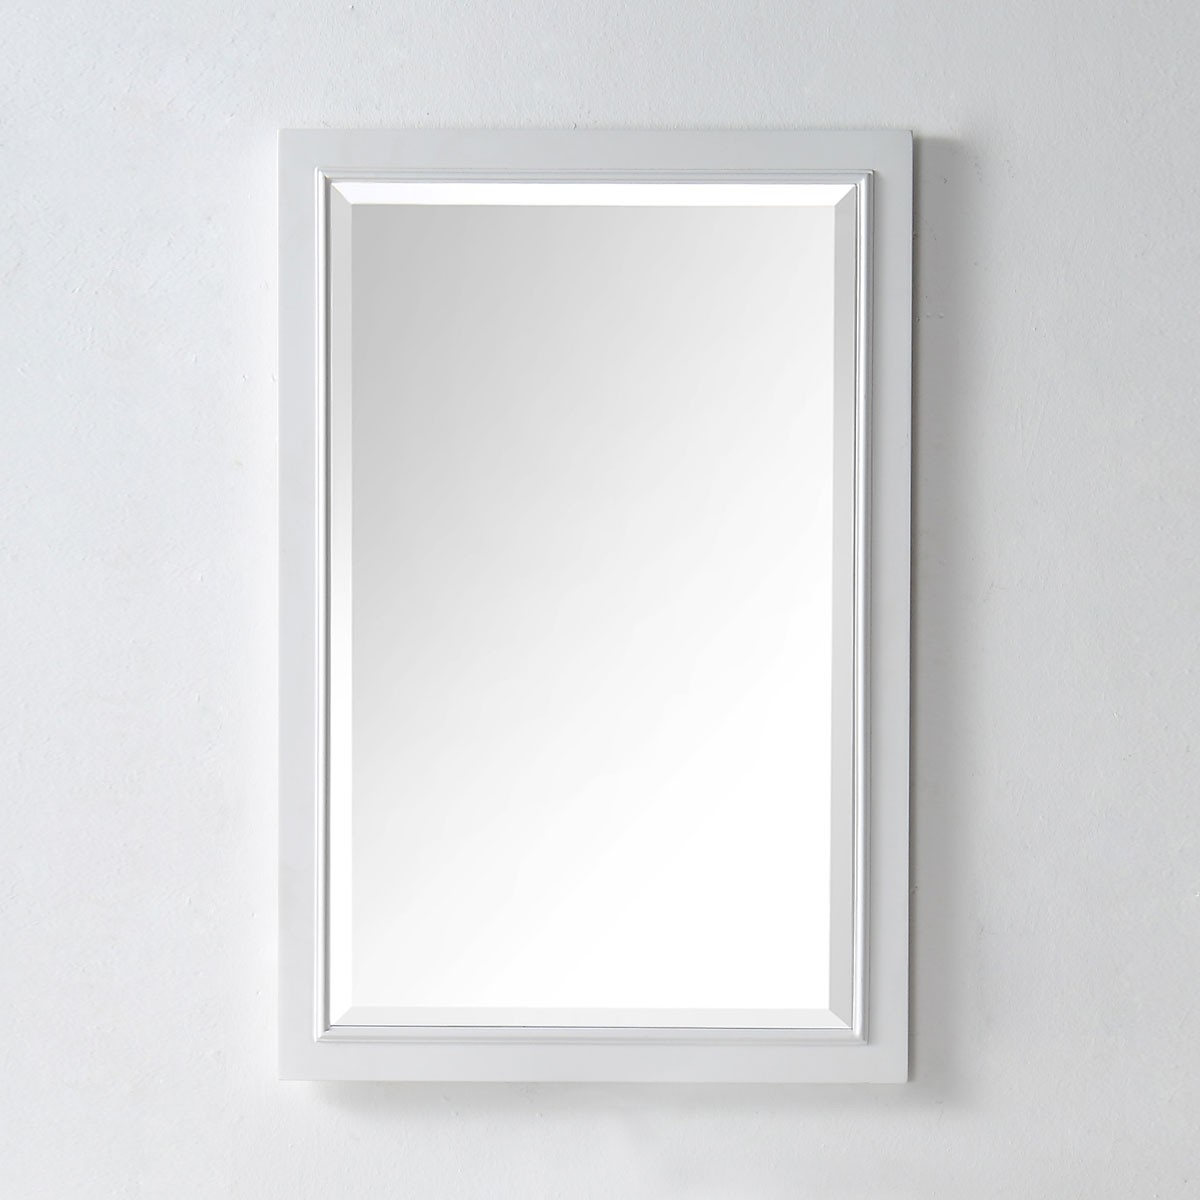 24 x 36 In Mirror with White Frame (DK-6000-WM) | Decoraport USA